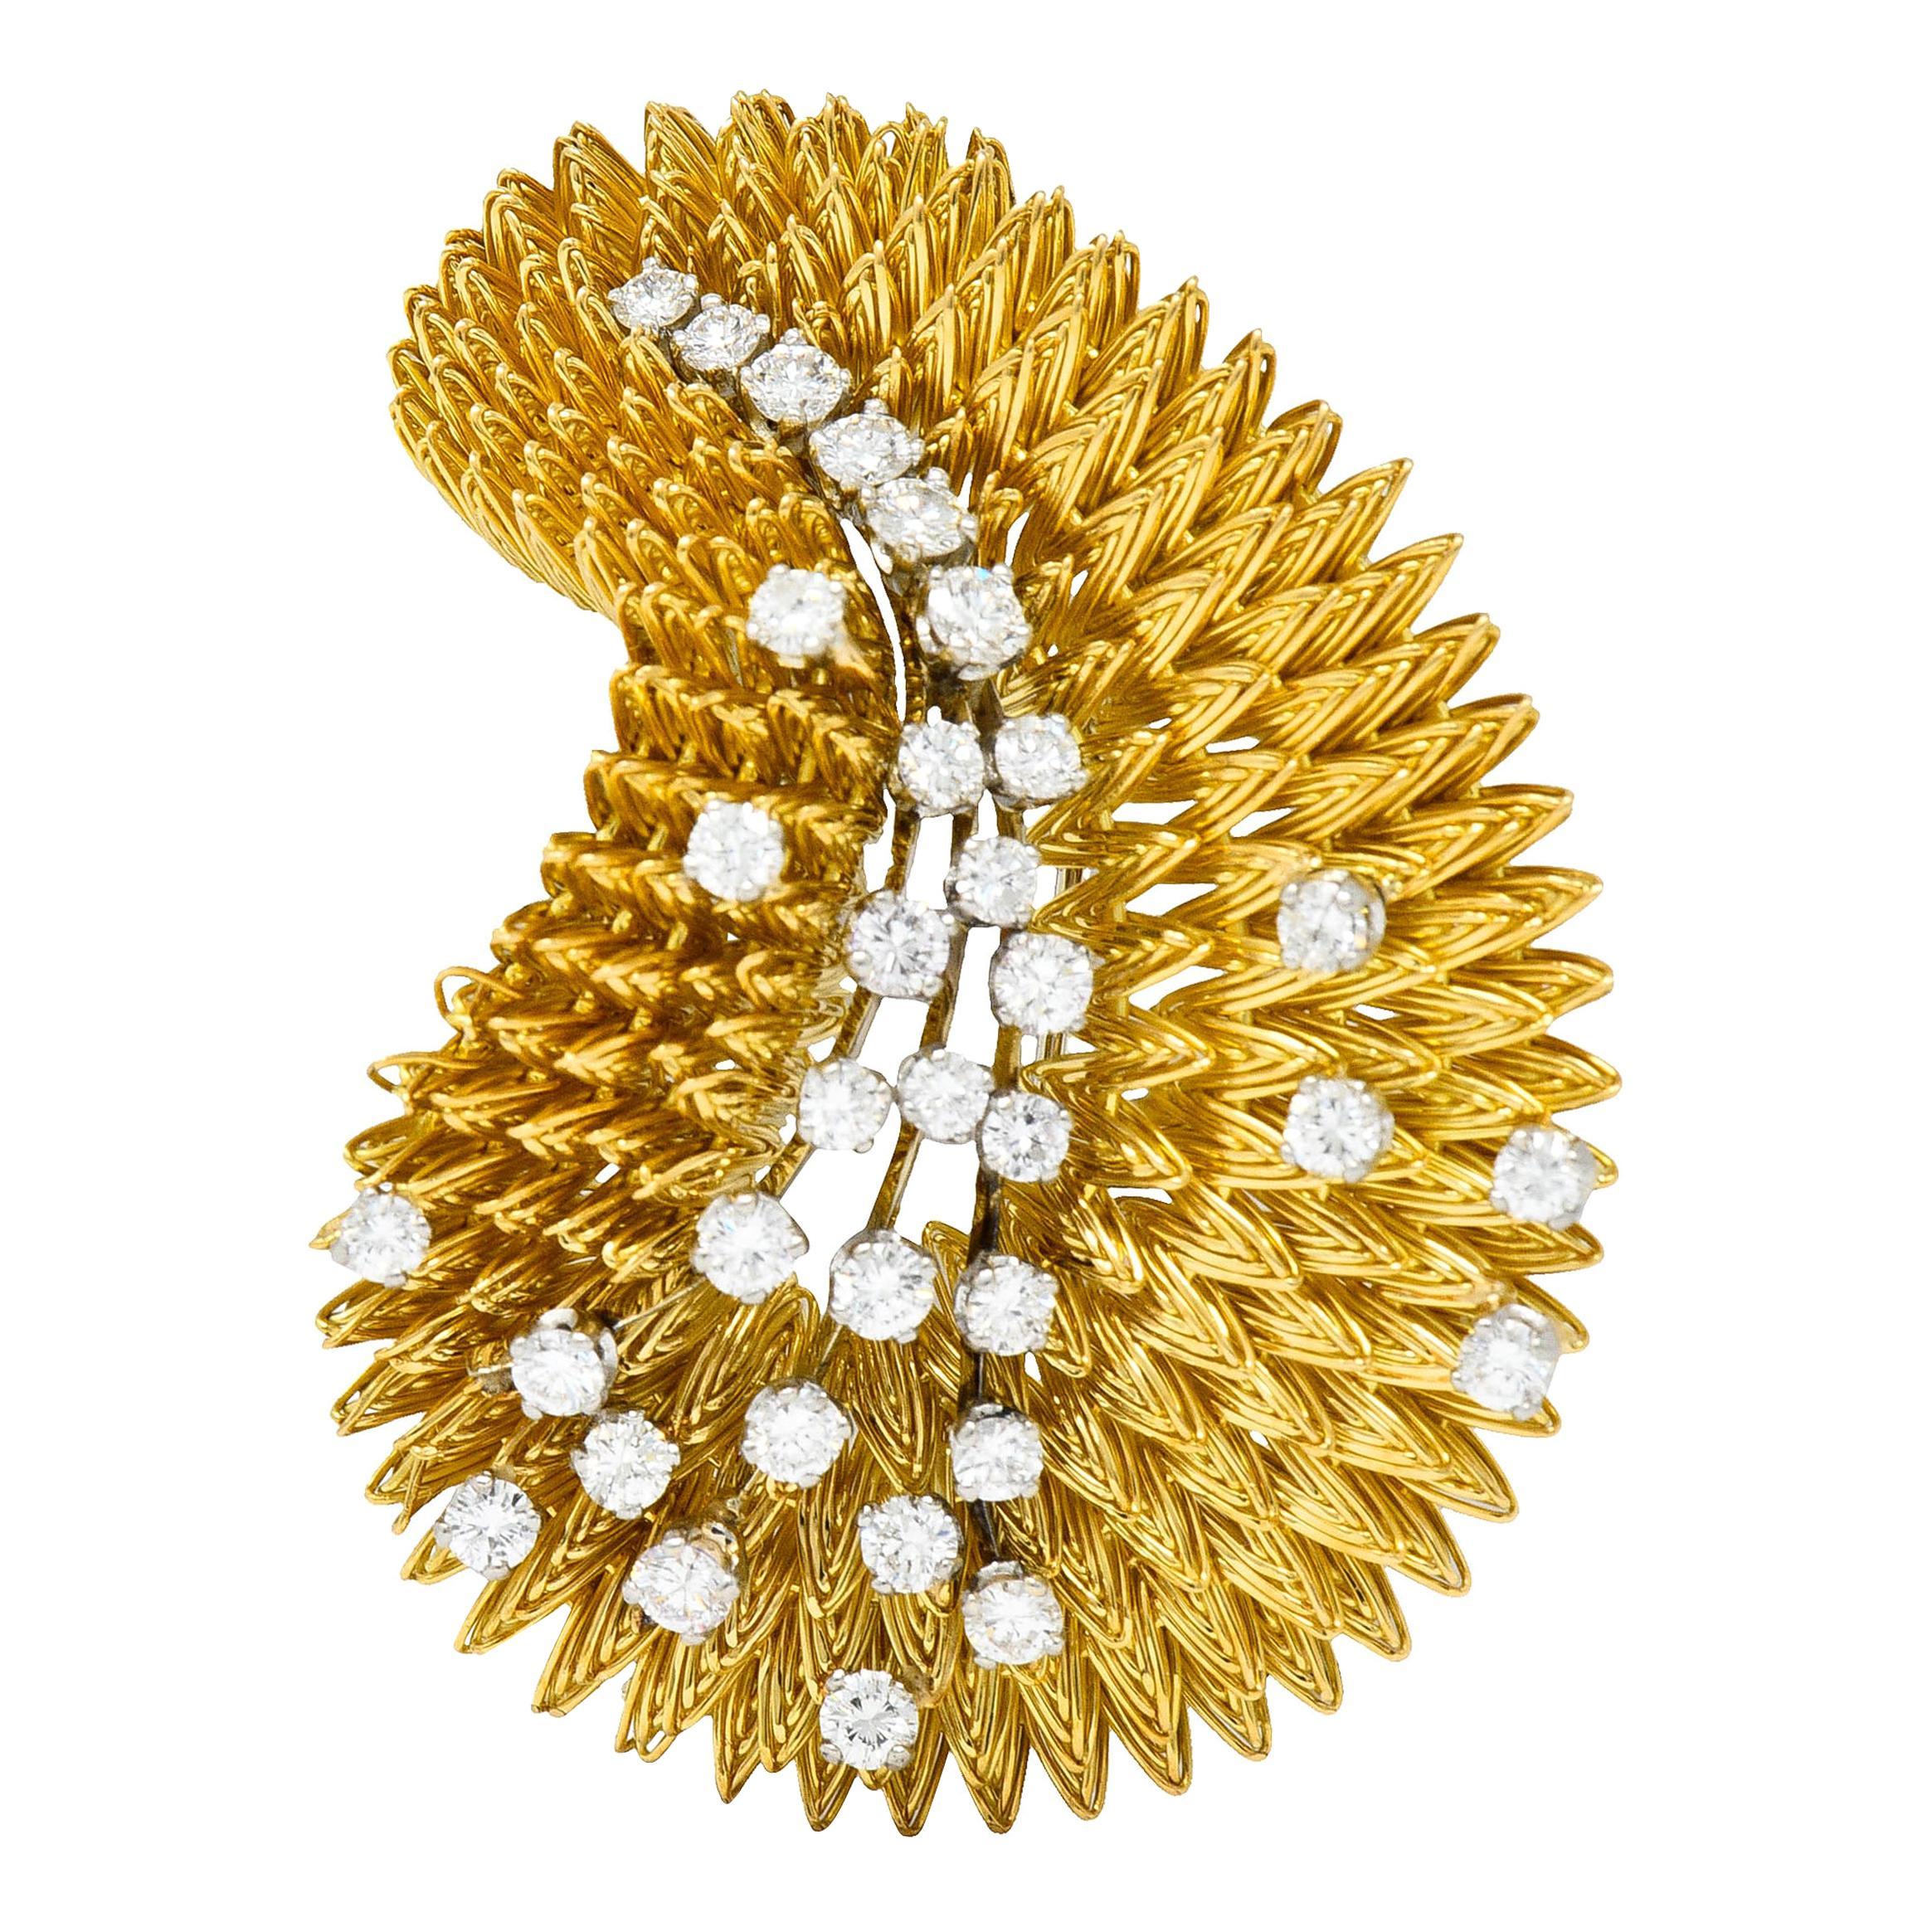 French Tiffany & Co. 1.60 Carats Diamond 18 Karat Gold Vintage Burst Brooch